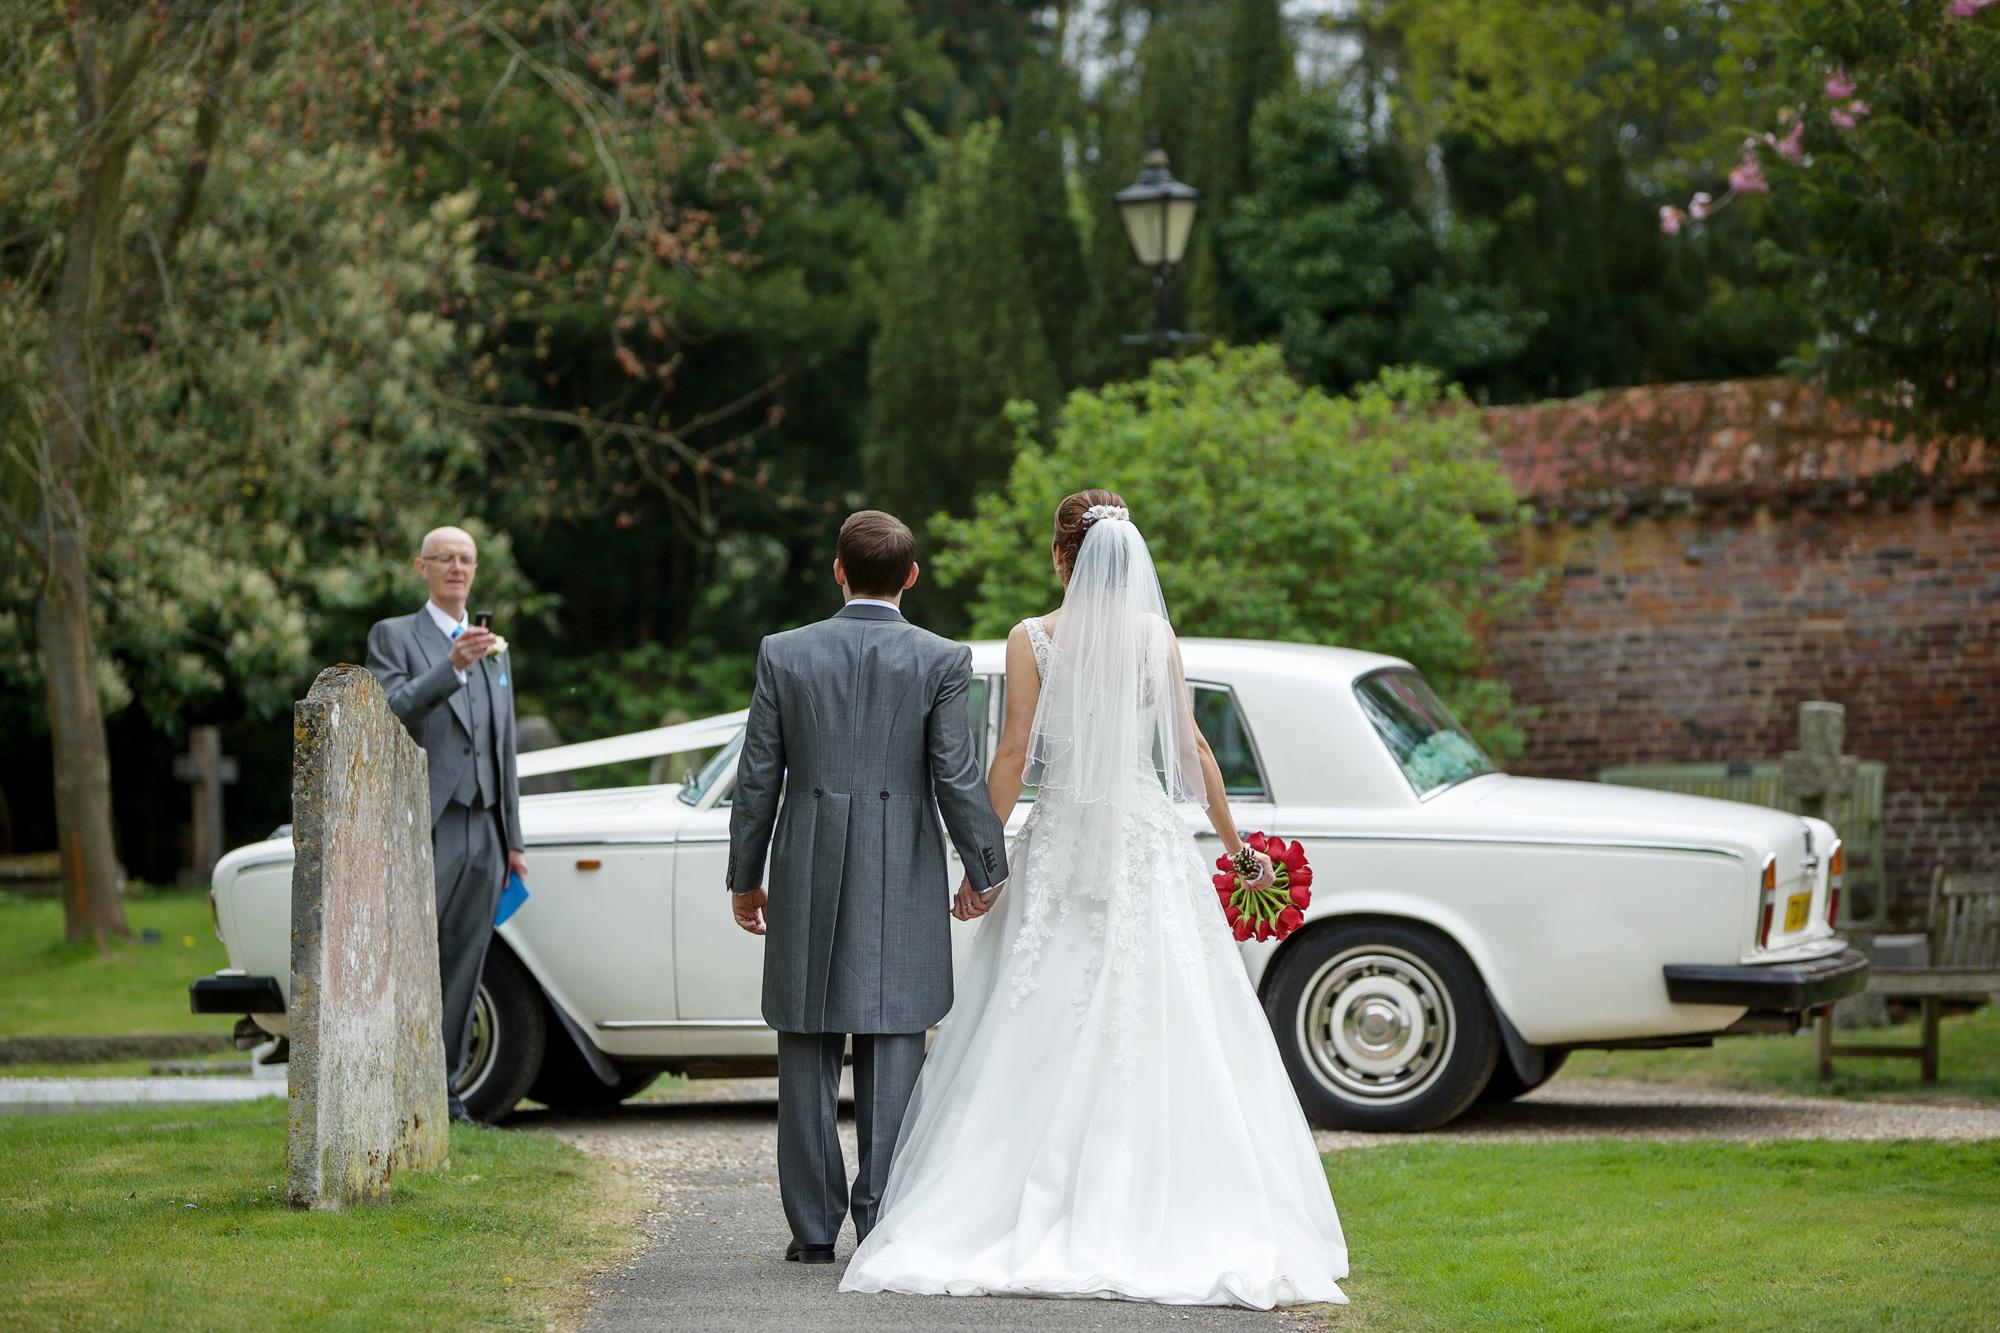 Adam_Hillier_Wedding_Photographer_Newbury_Berkshire_7 (7).jpg